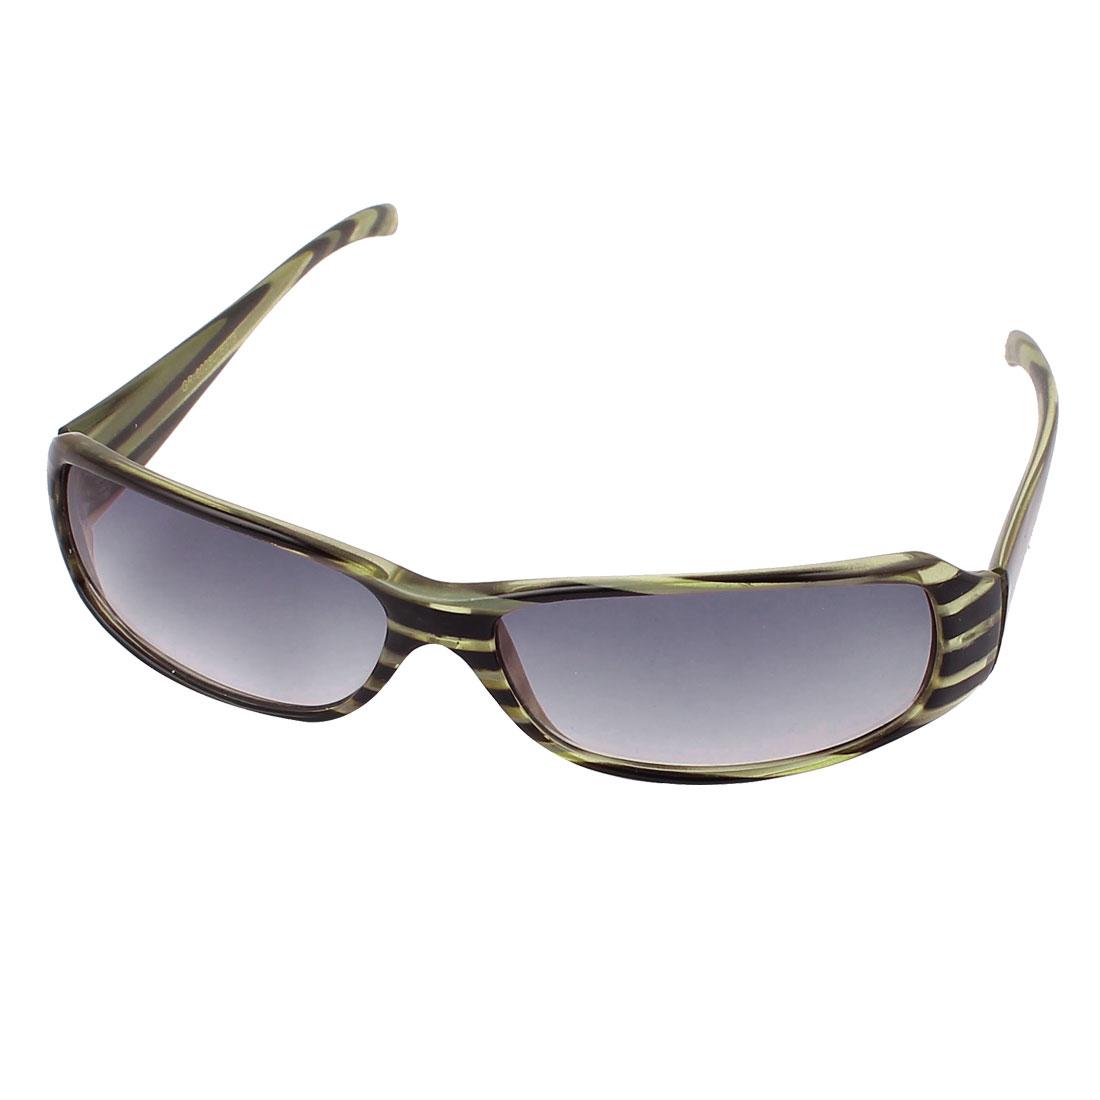 Unisex Men Women Striped Frame Sunglasses Outdoor Eyewear Glasses